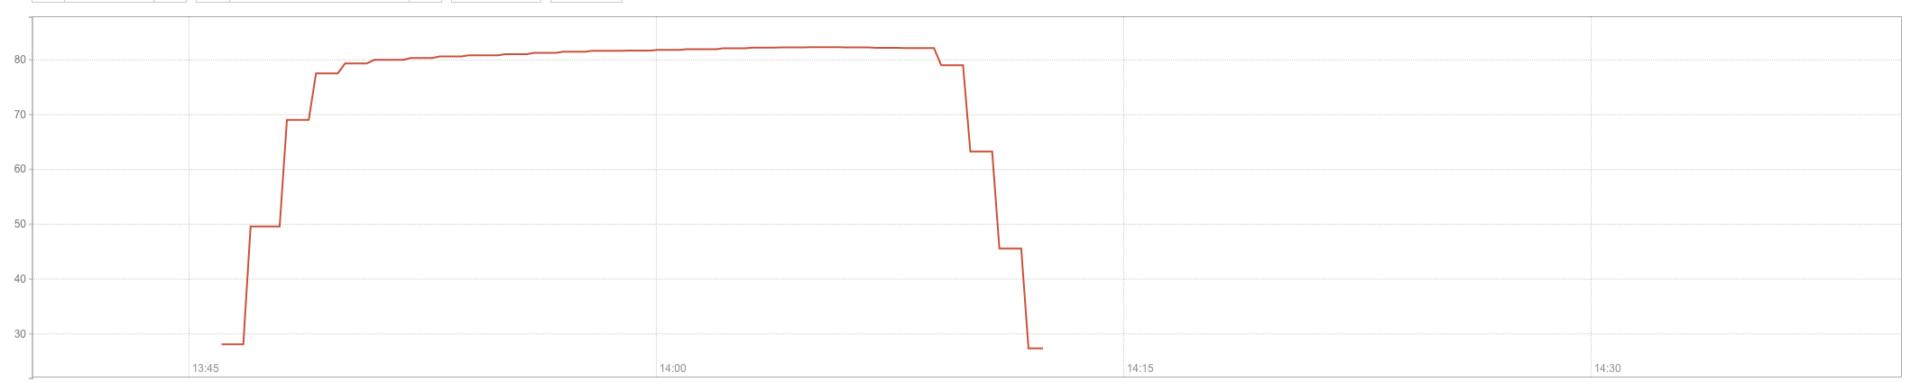 всплеск нагрузки на CPU в Cloudflare